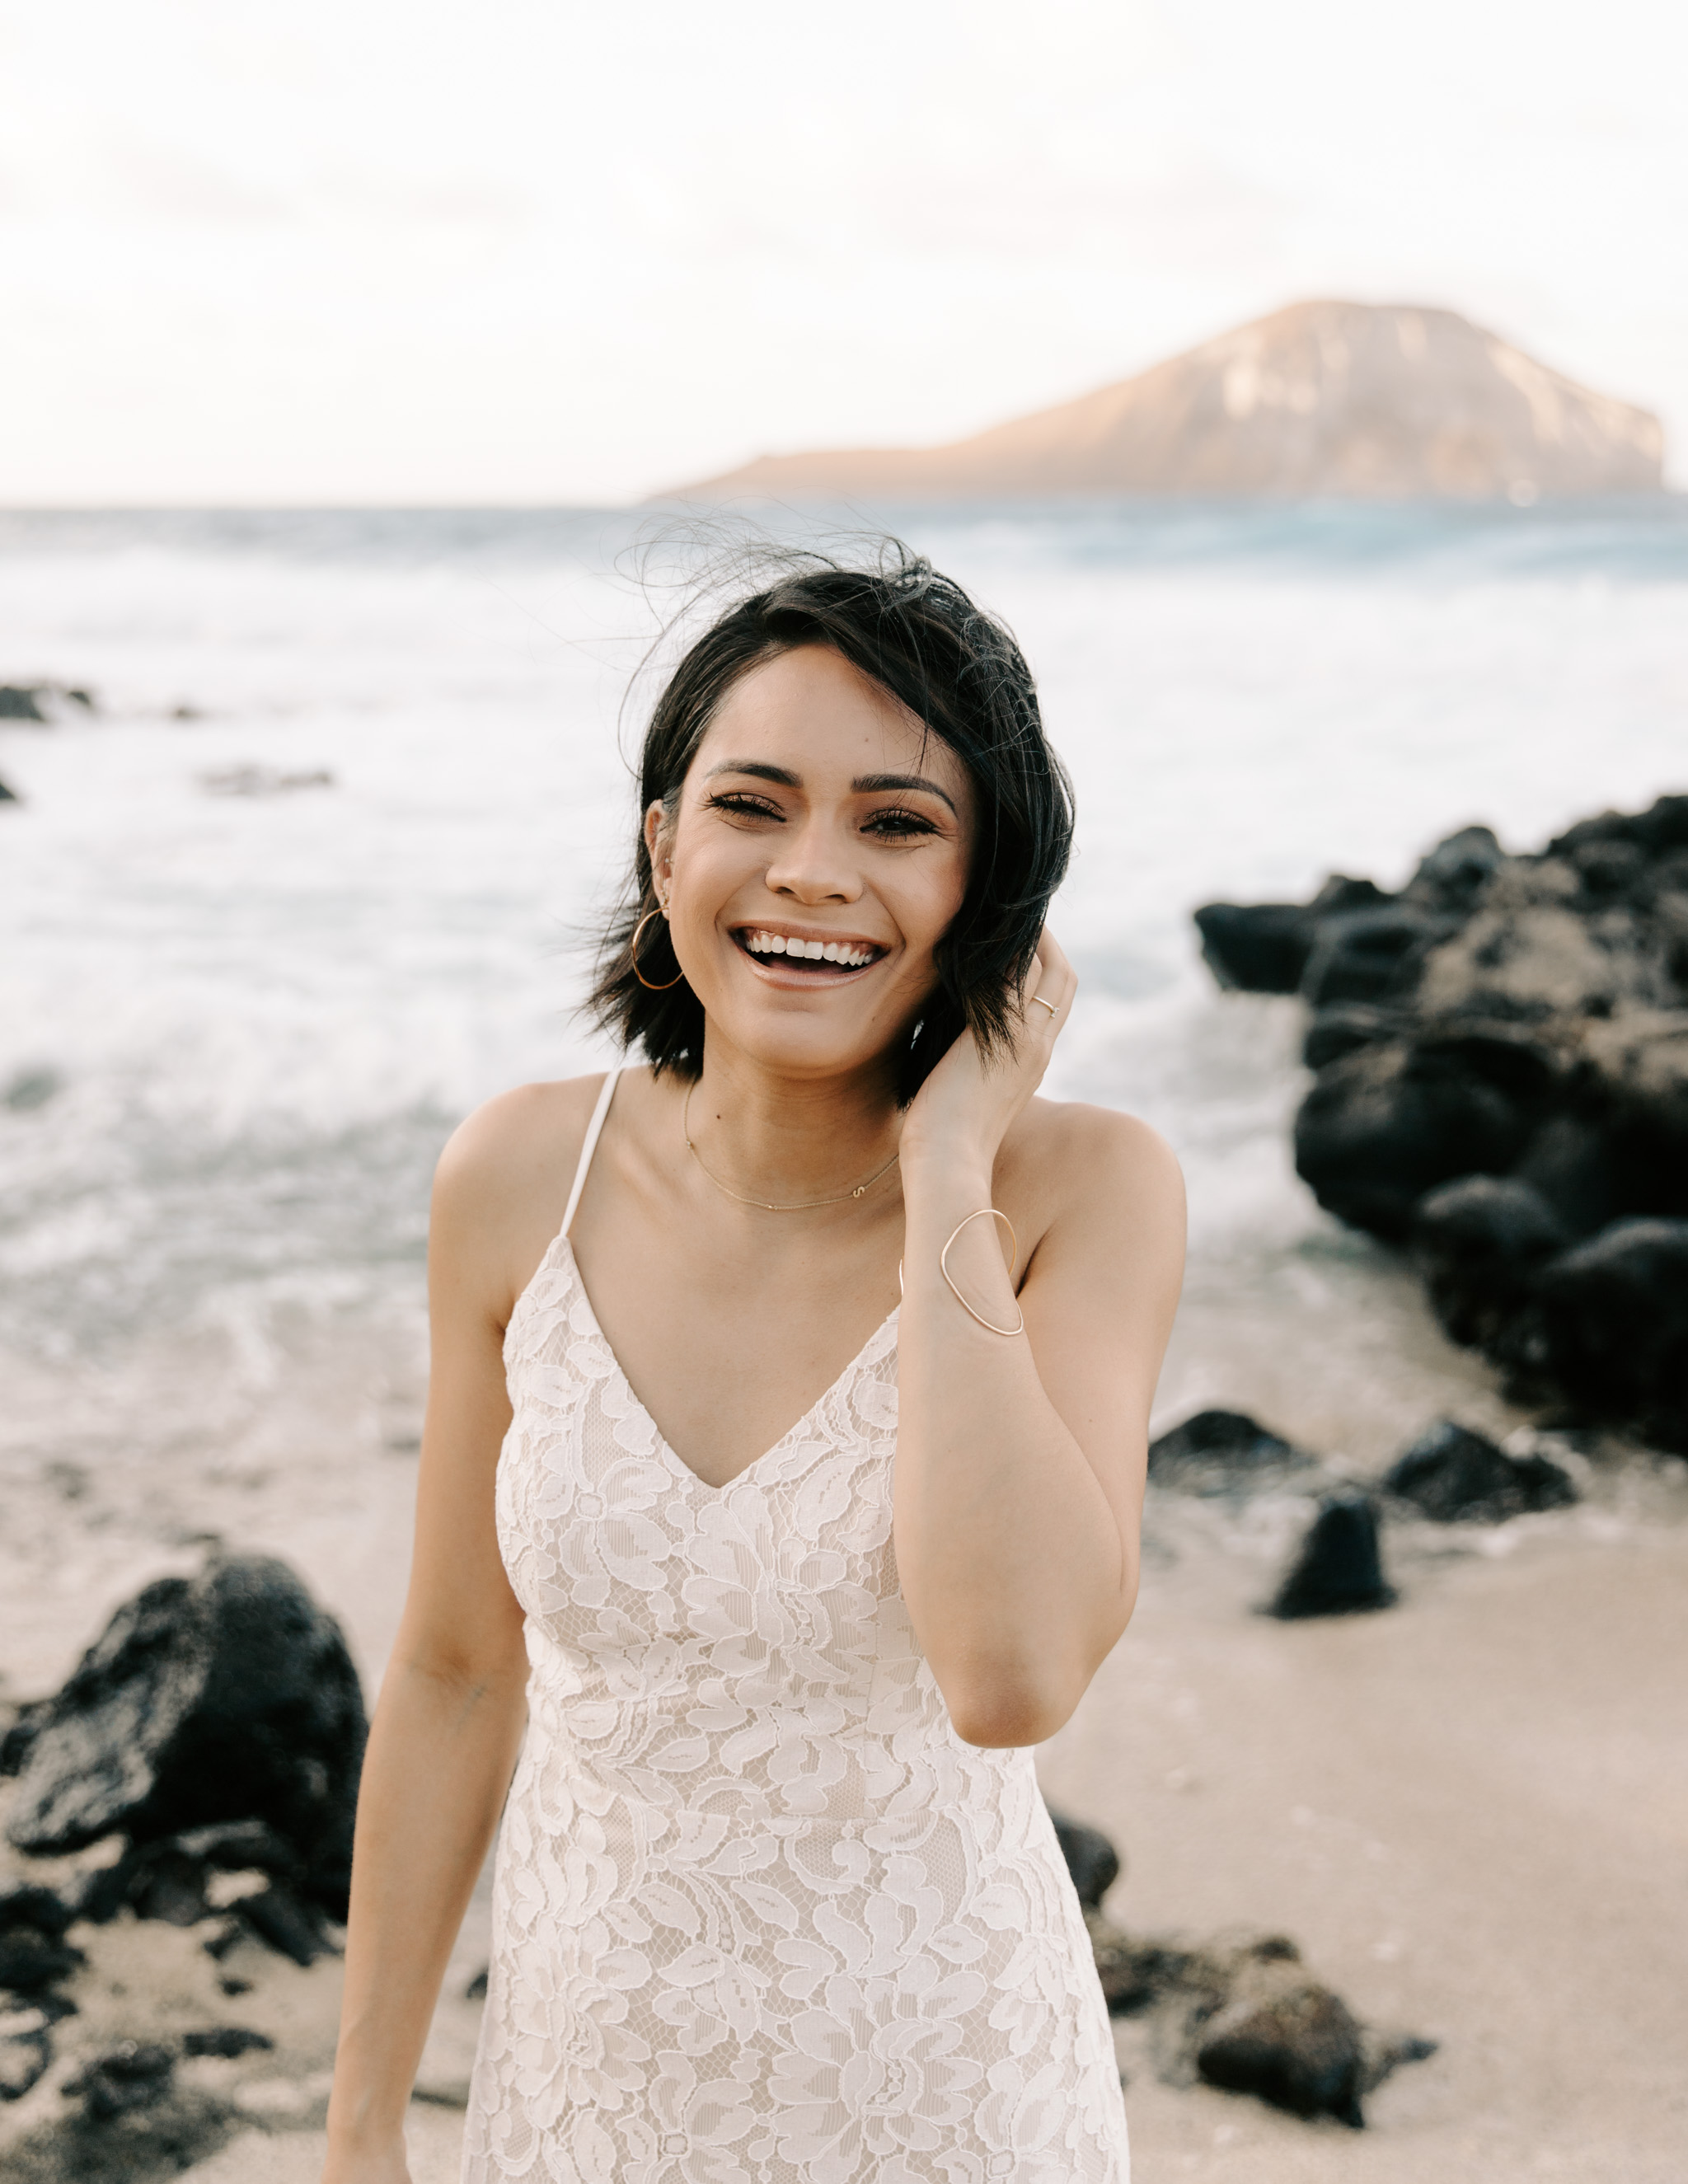 makapuu bridal portraits by oahu elopement photographer Desiree Leilani